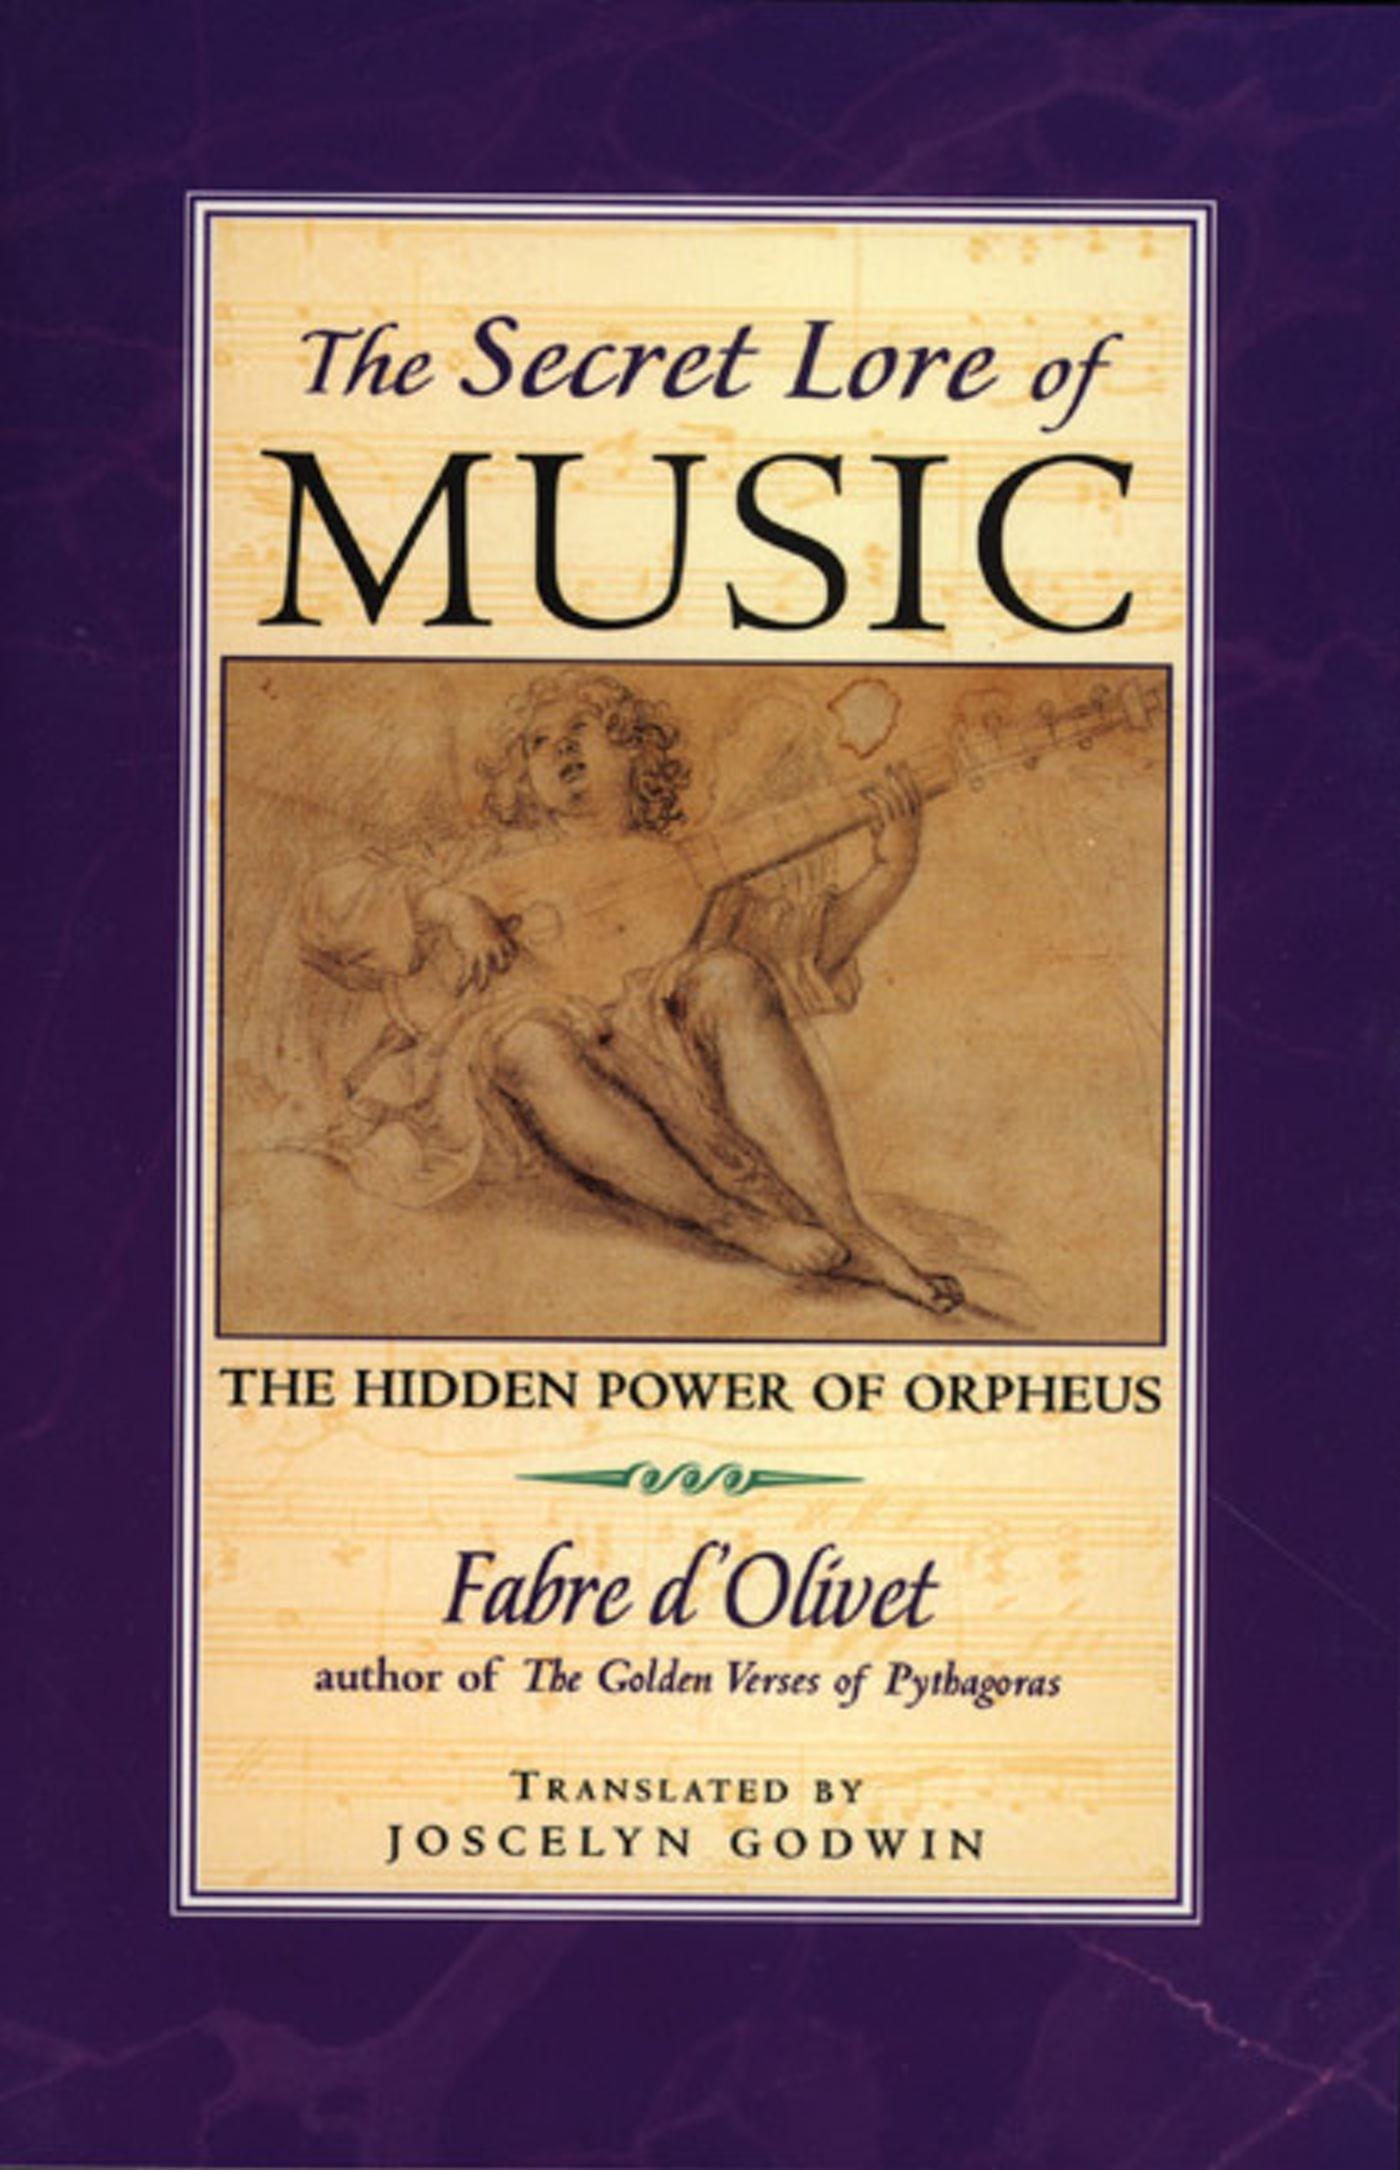 The Secret Lore Of Music The Hidden Power Of Orpheus Fabre D